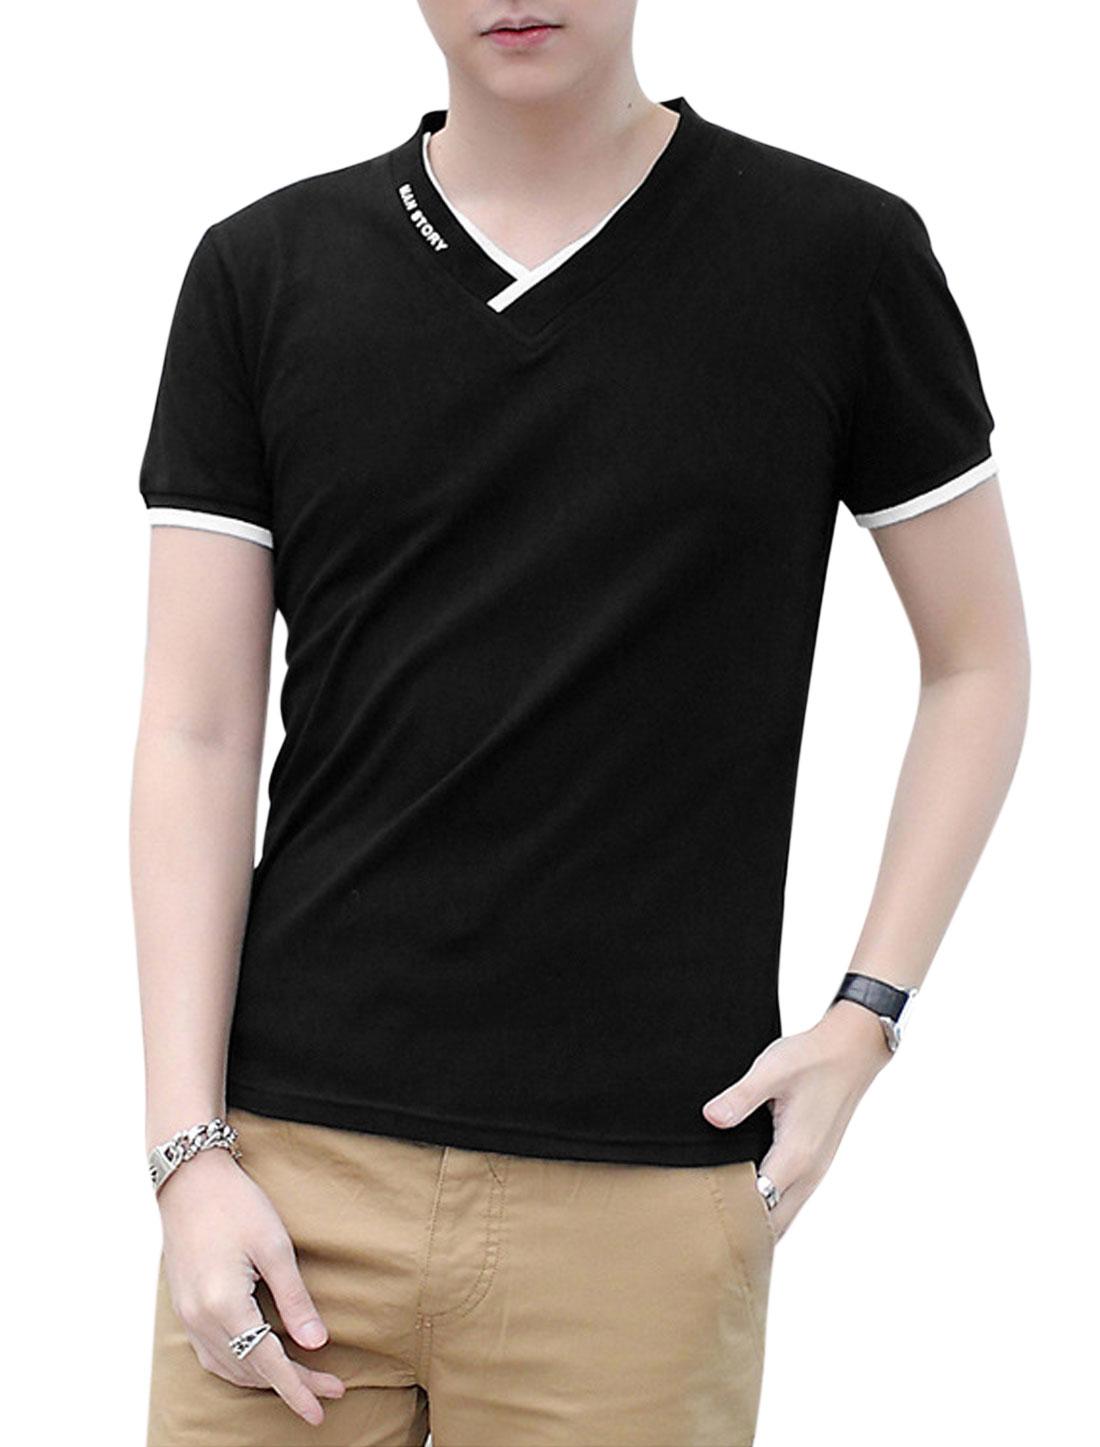 Men Slipover Short Sleeve V Neck Slim Fit Casual T Shirts Black M